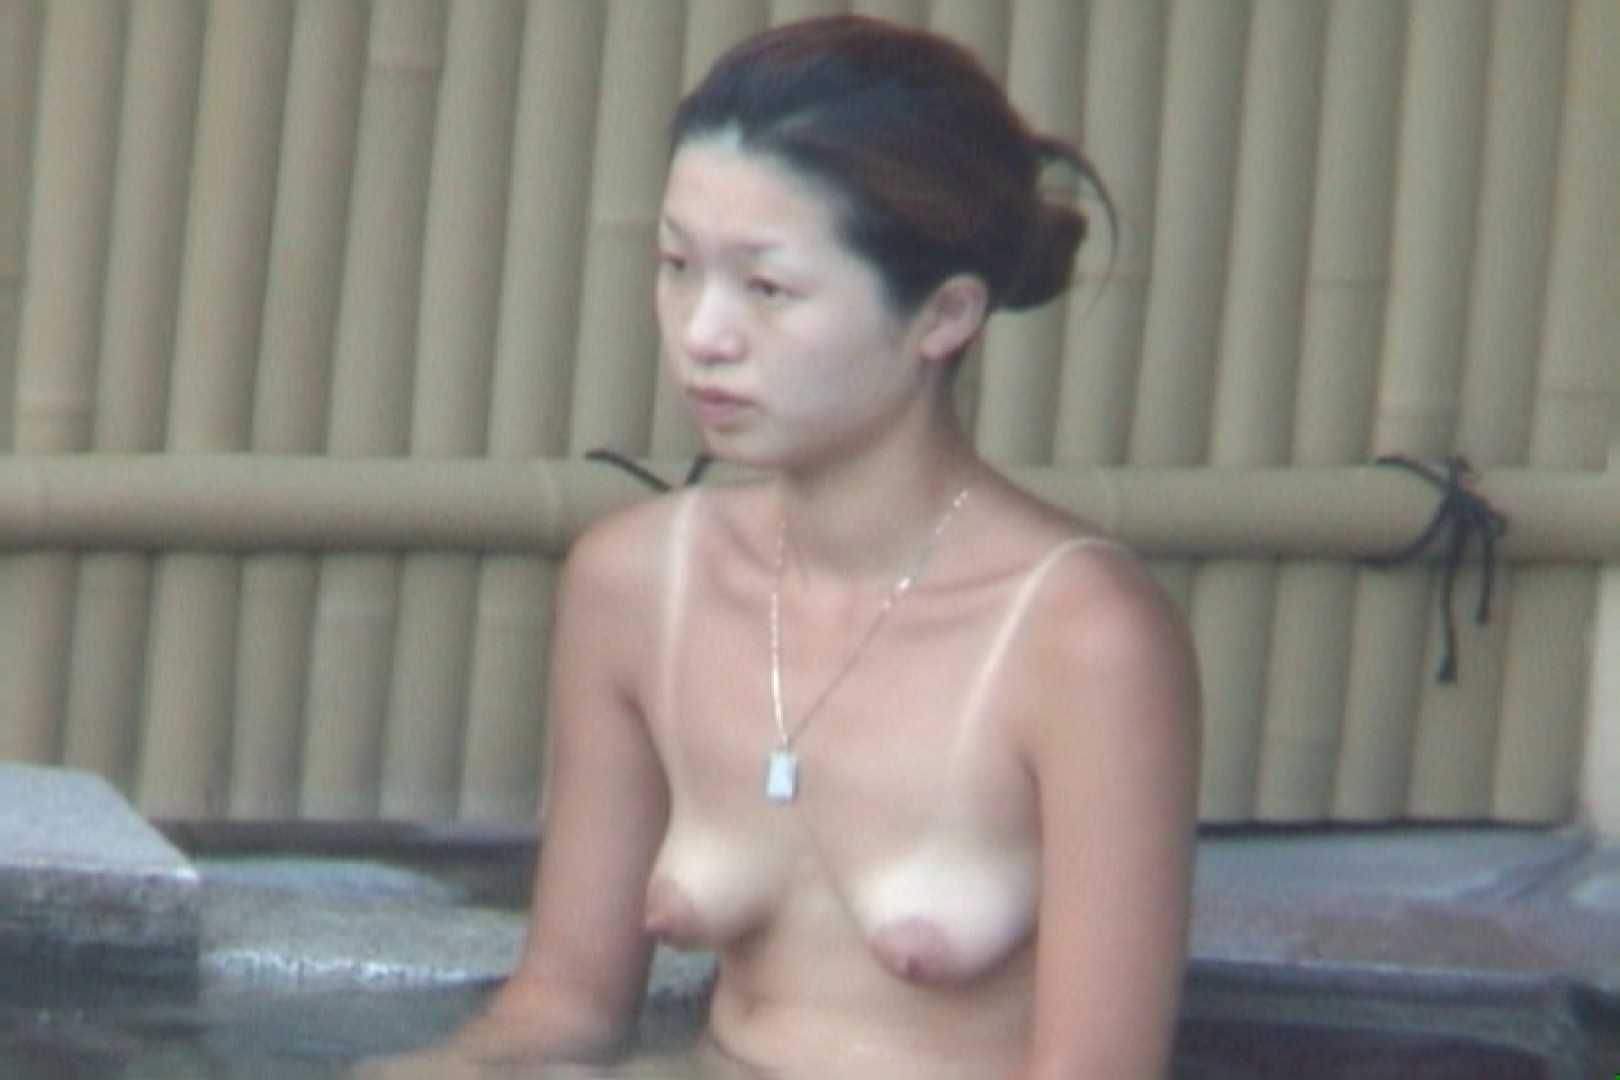 Aquaな露天風呂Vol.571 盗撮 | OLセックス  83画像 49